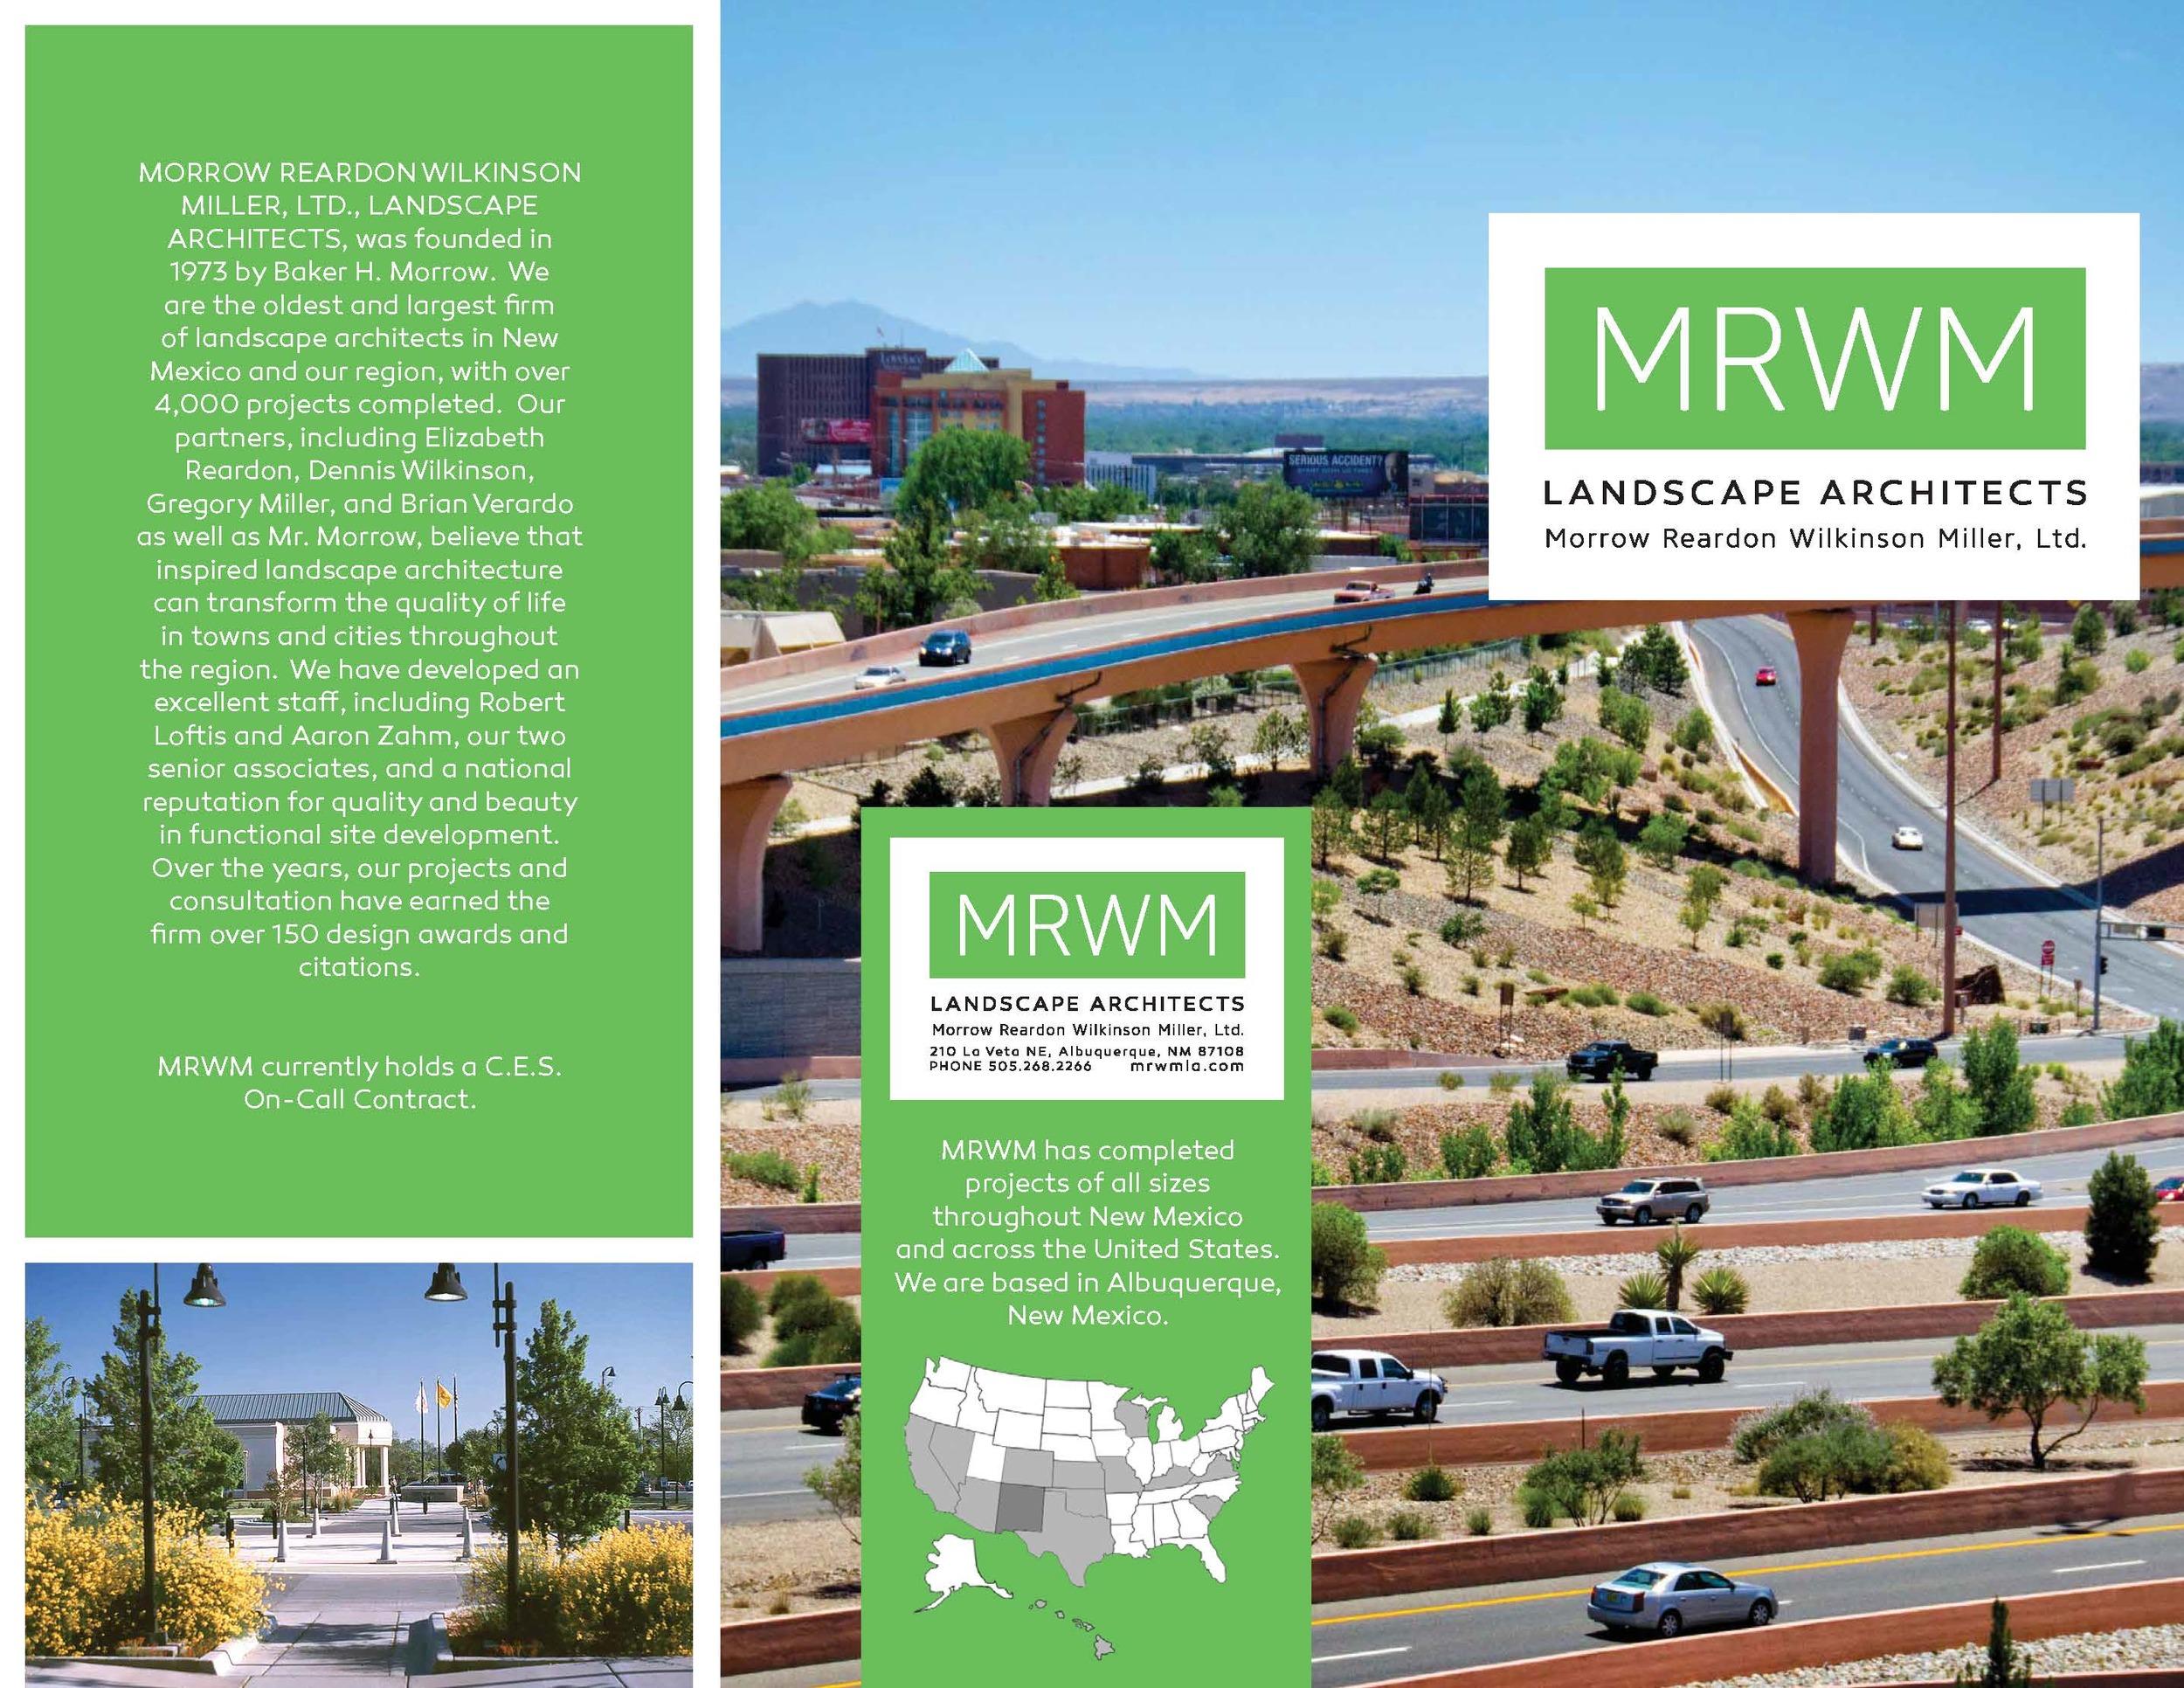 mrwm landscape architects brochure